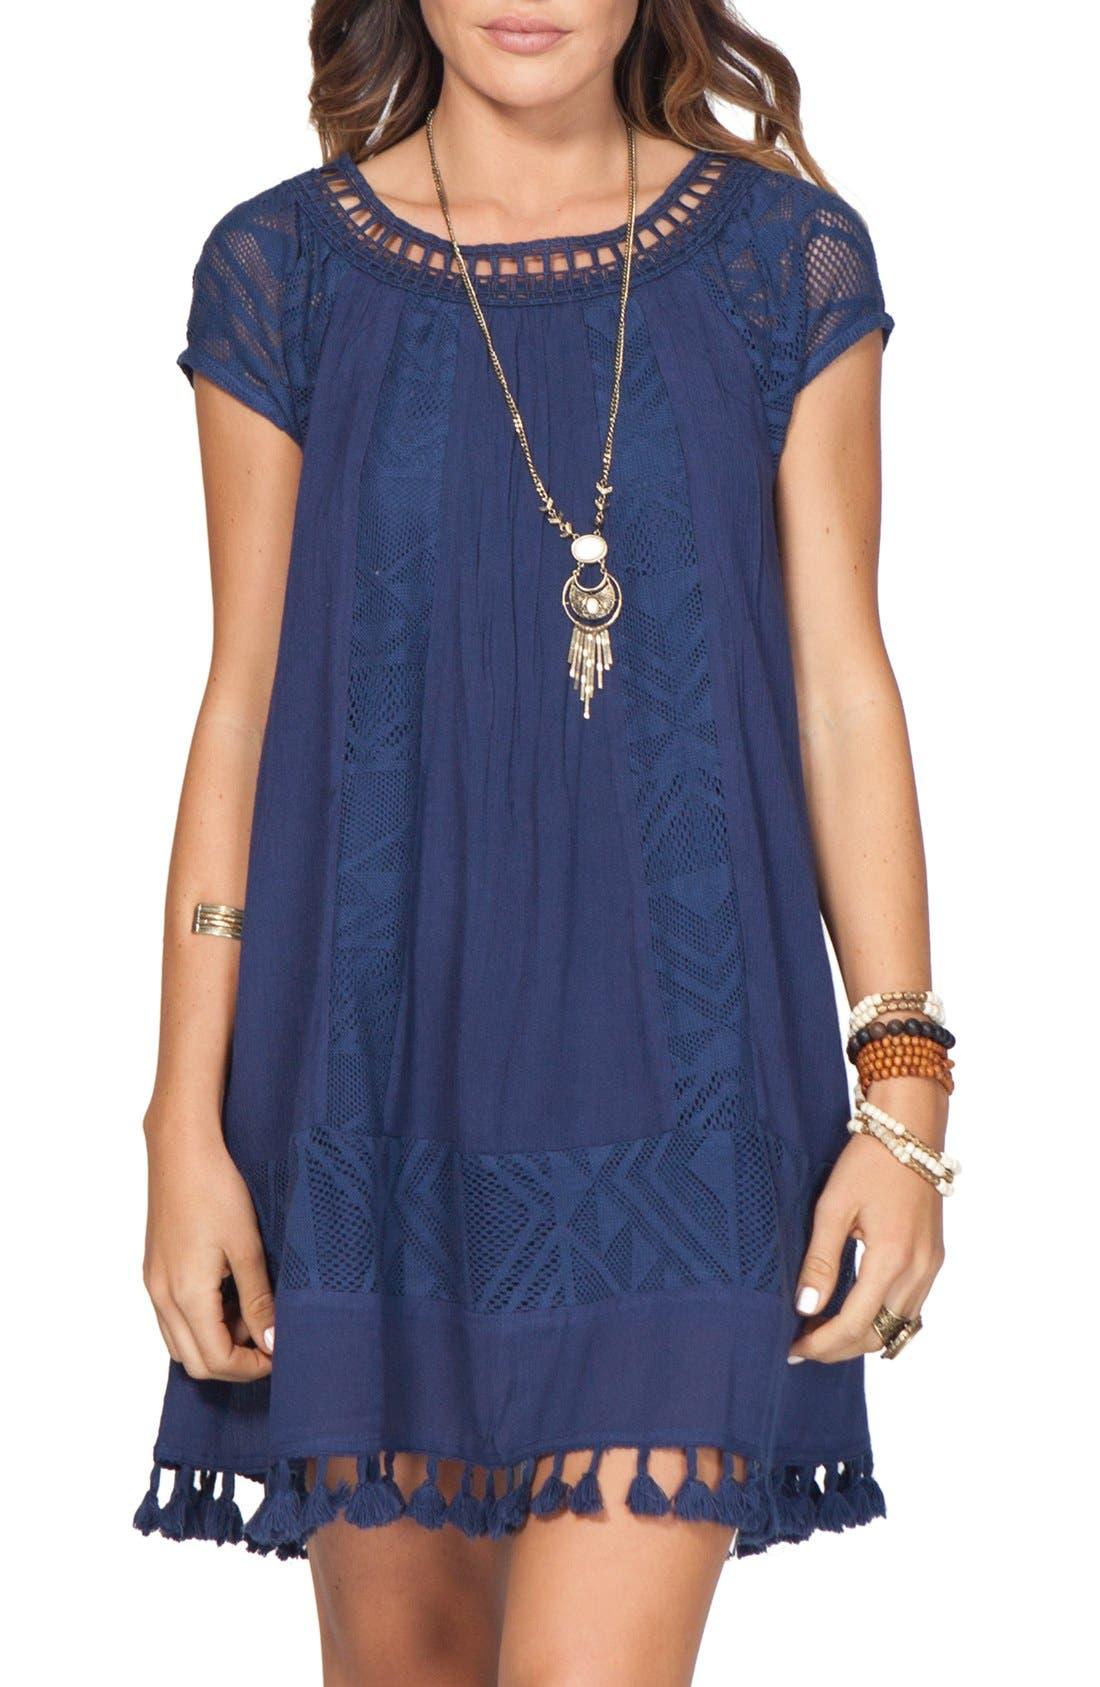 Alternate Image 1 Selected - Rip Curl 'Lovebird' Dress